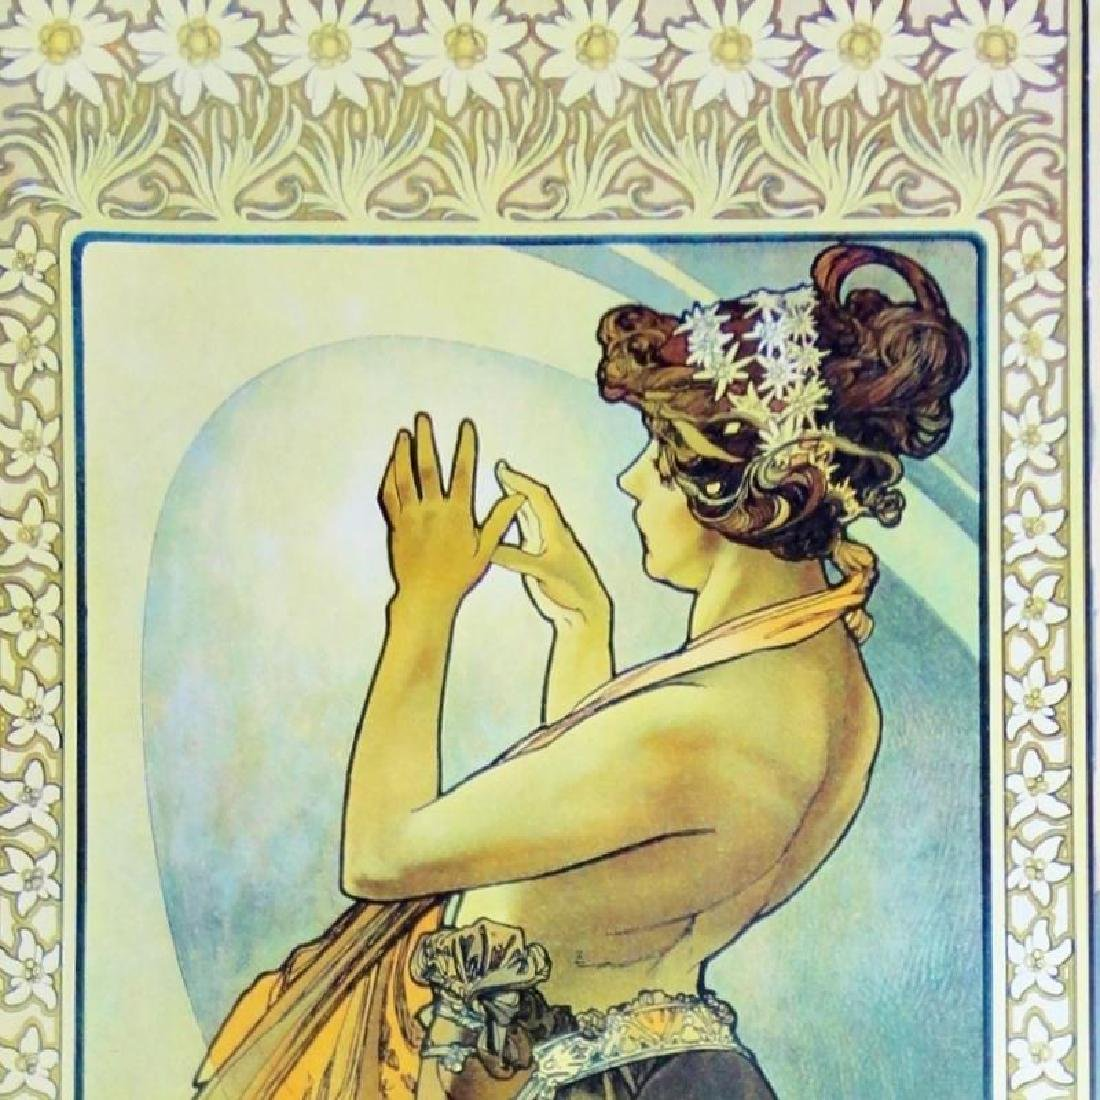 3 Large Mucha Repro Antique Poster Art Prints 48X18 - 5